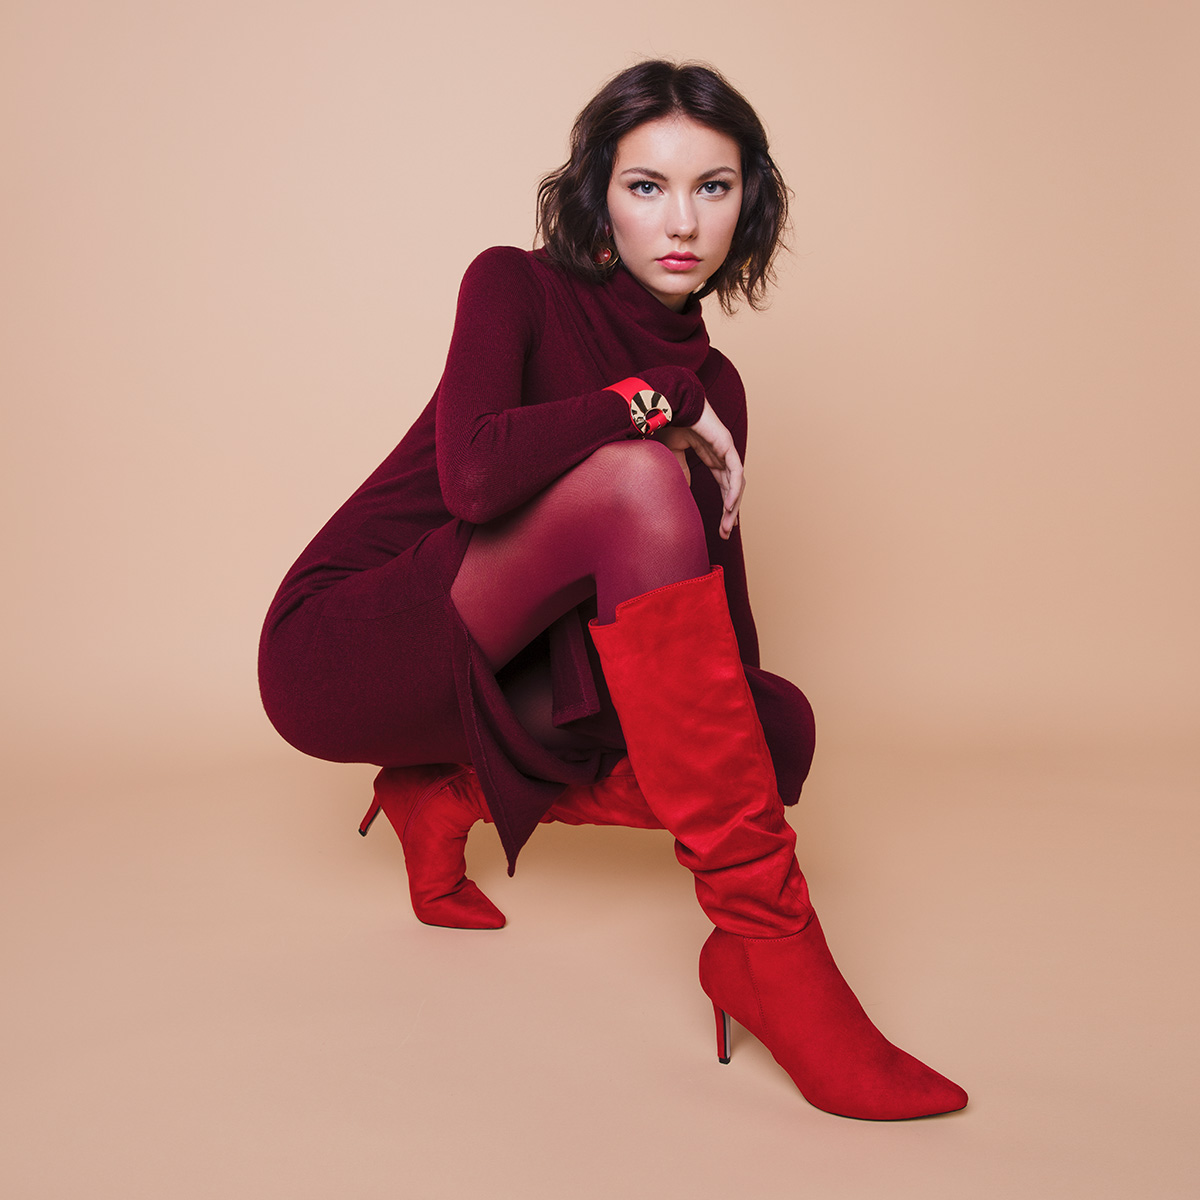 Petra Windschnurer: Zgodba o rdečih škornjih